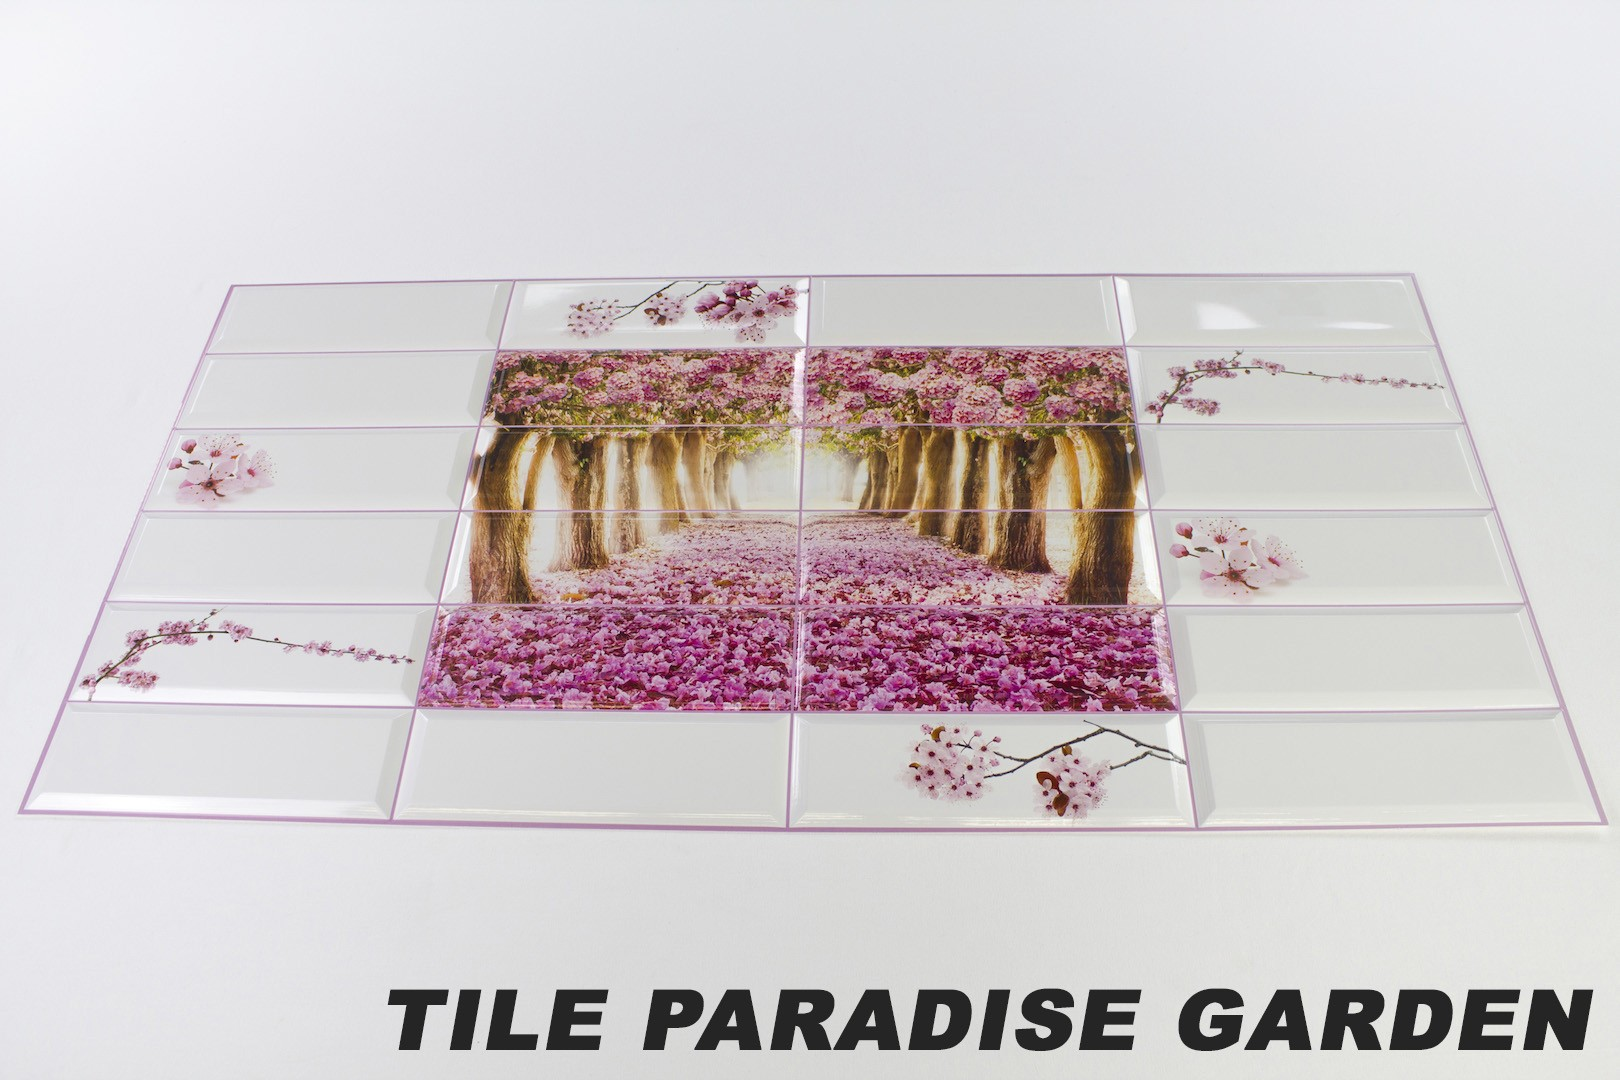 Tile paradise garden originalbild